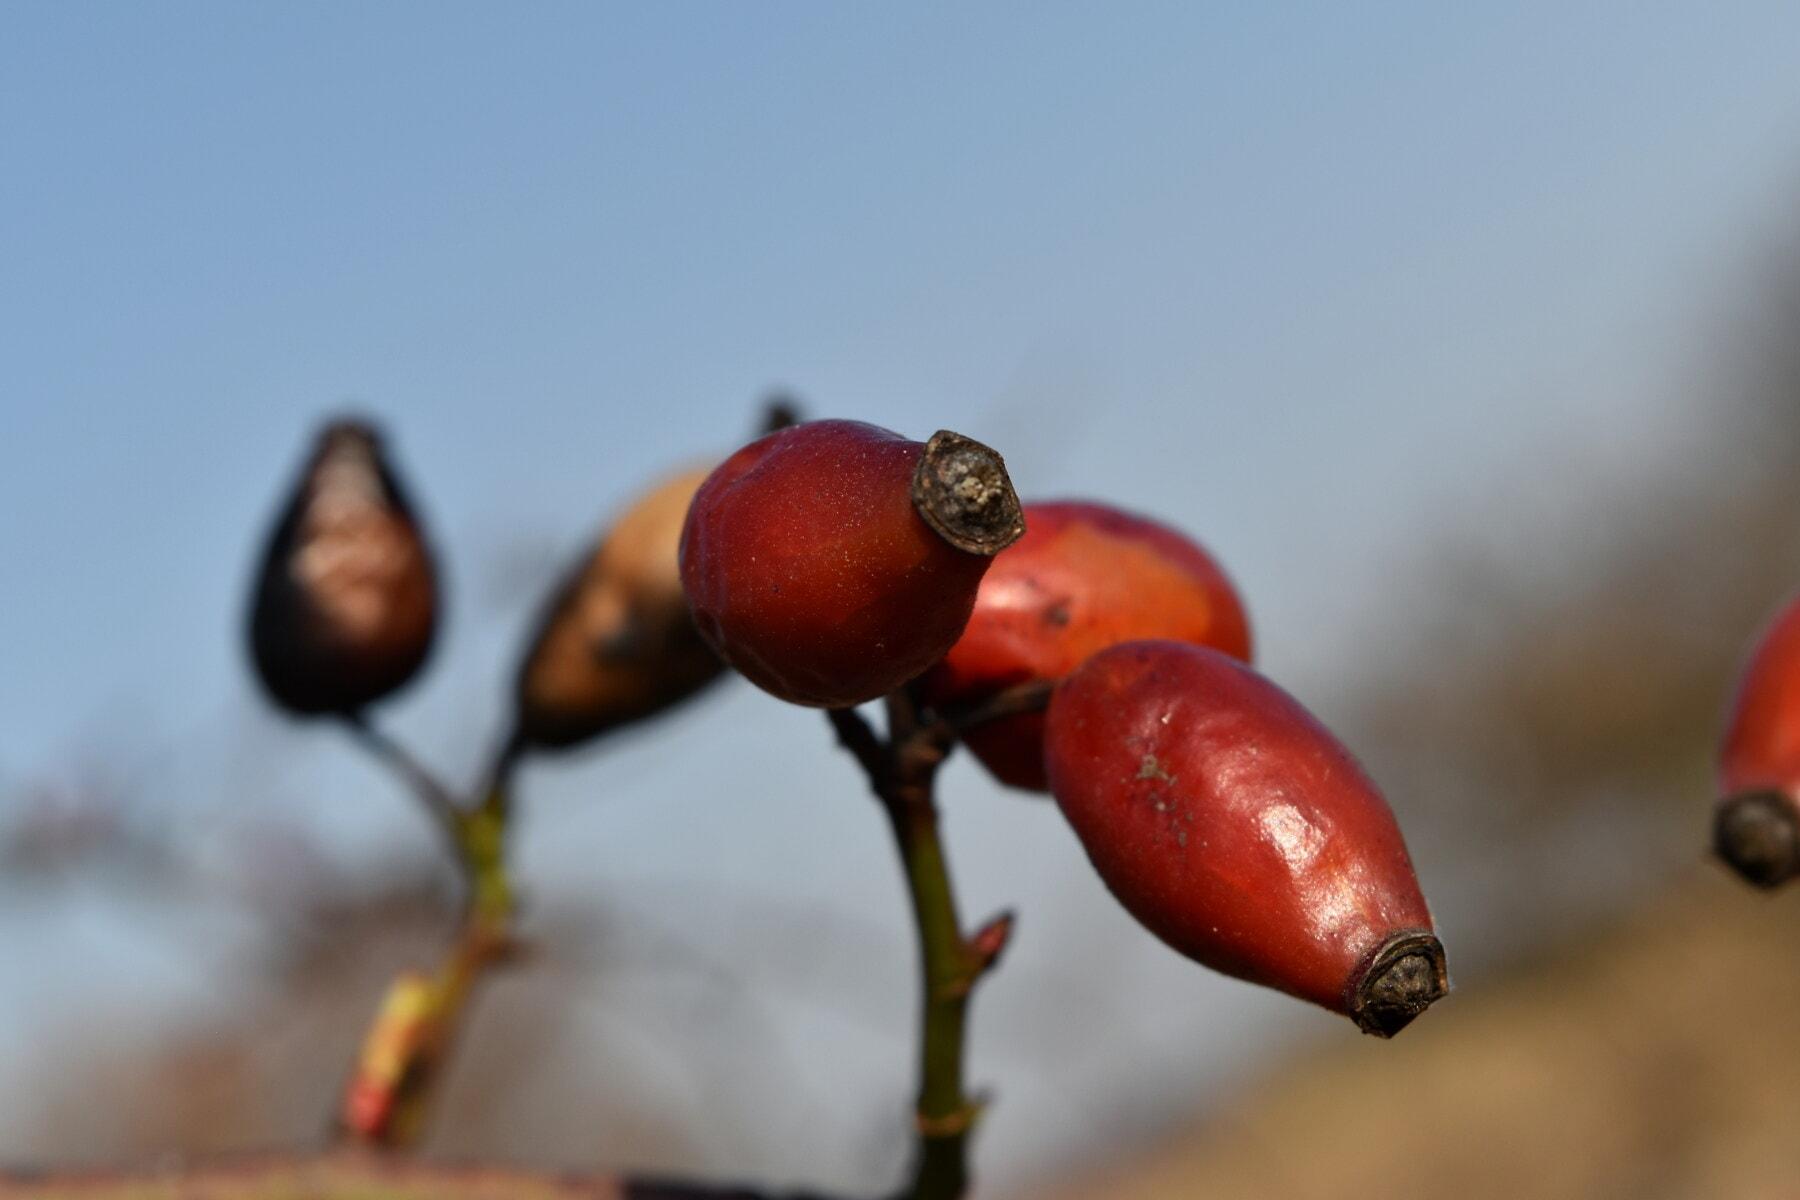 grane, crveno, biljka, ruža, C vitamin, dijetetsko, hrana, priroda, zamagliti, na otvorenom